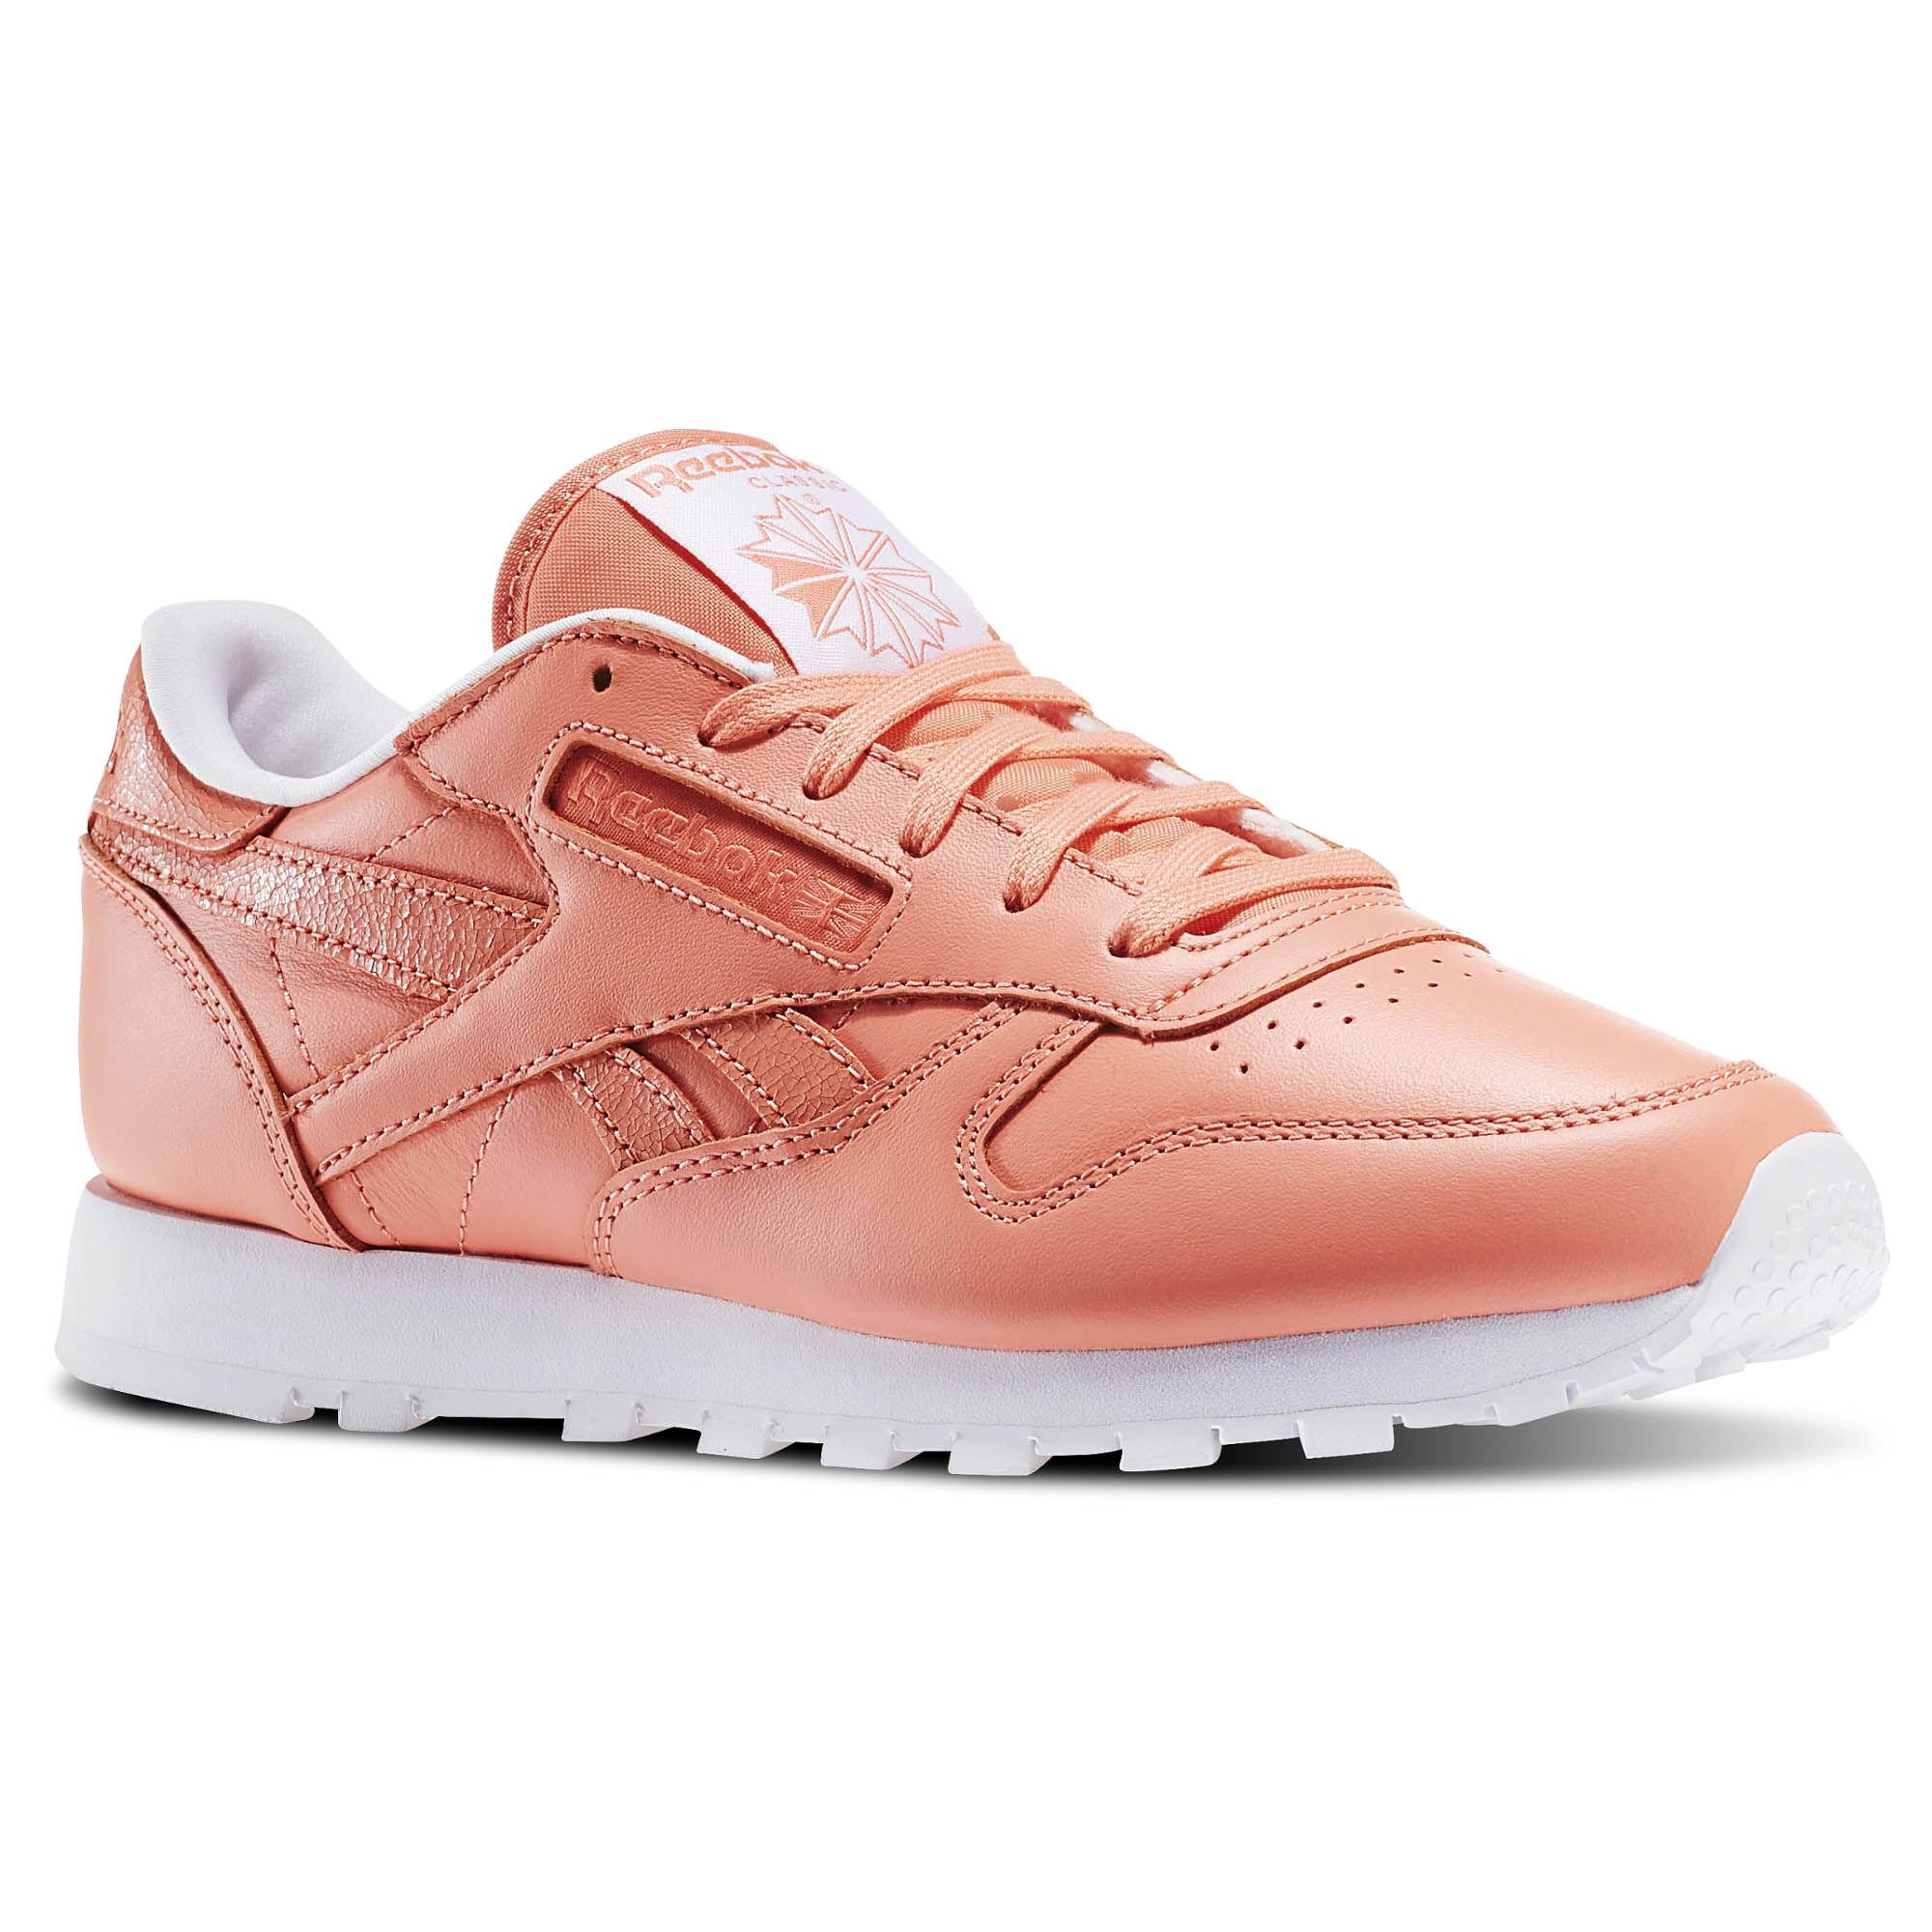 SOUR MELON//WHITE Reebok Classic Leather Pastel Grade School Kids Shoes BS8981